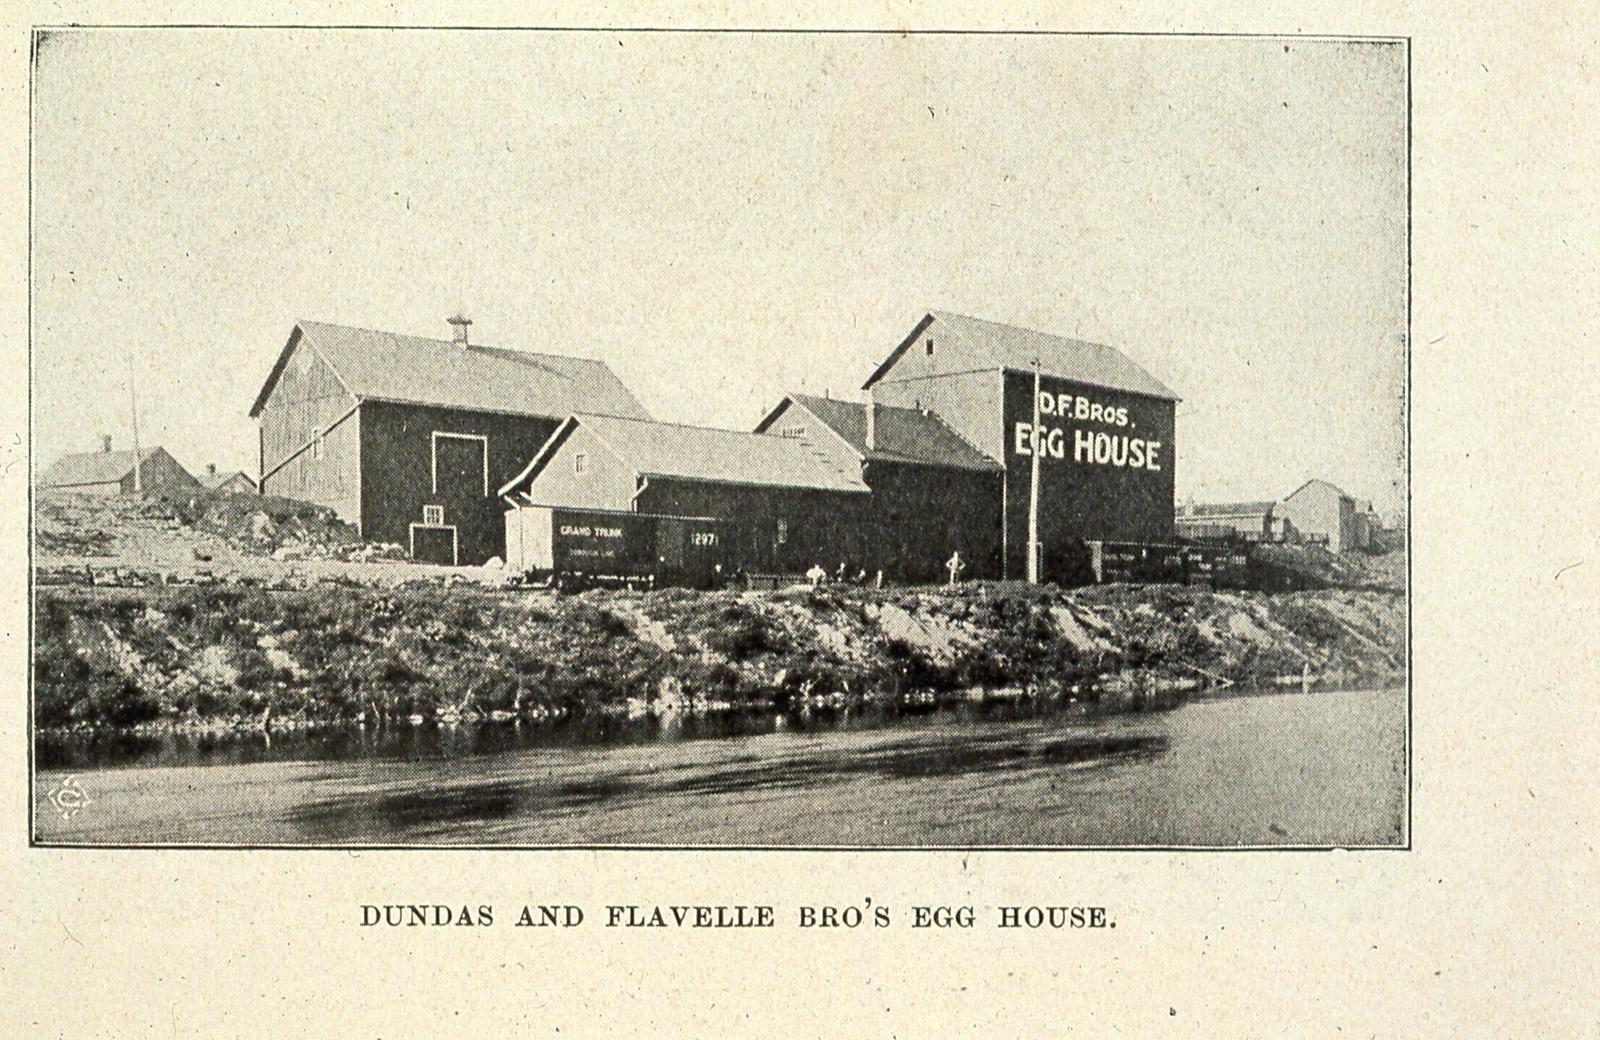 Dundas and Flavelle Egg House 1898